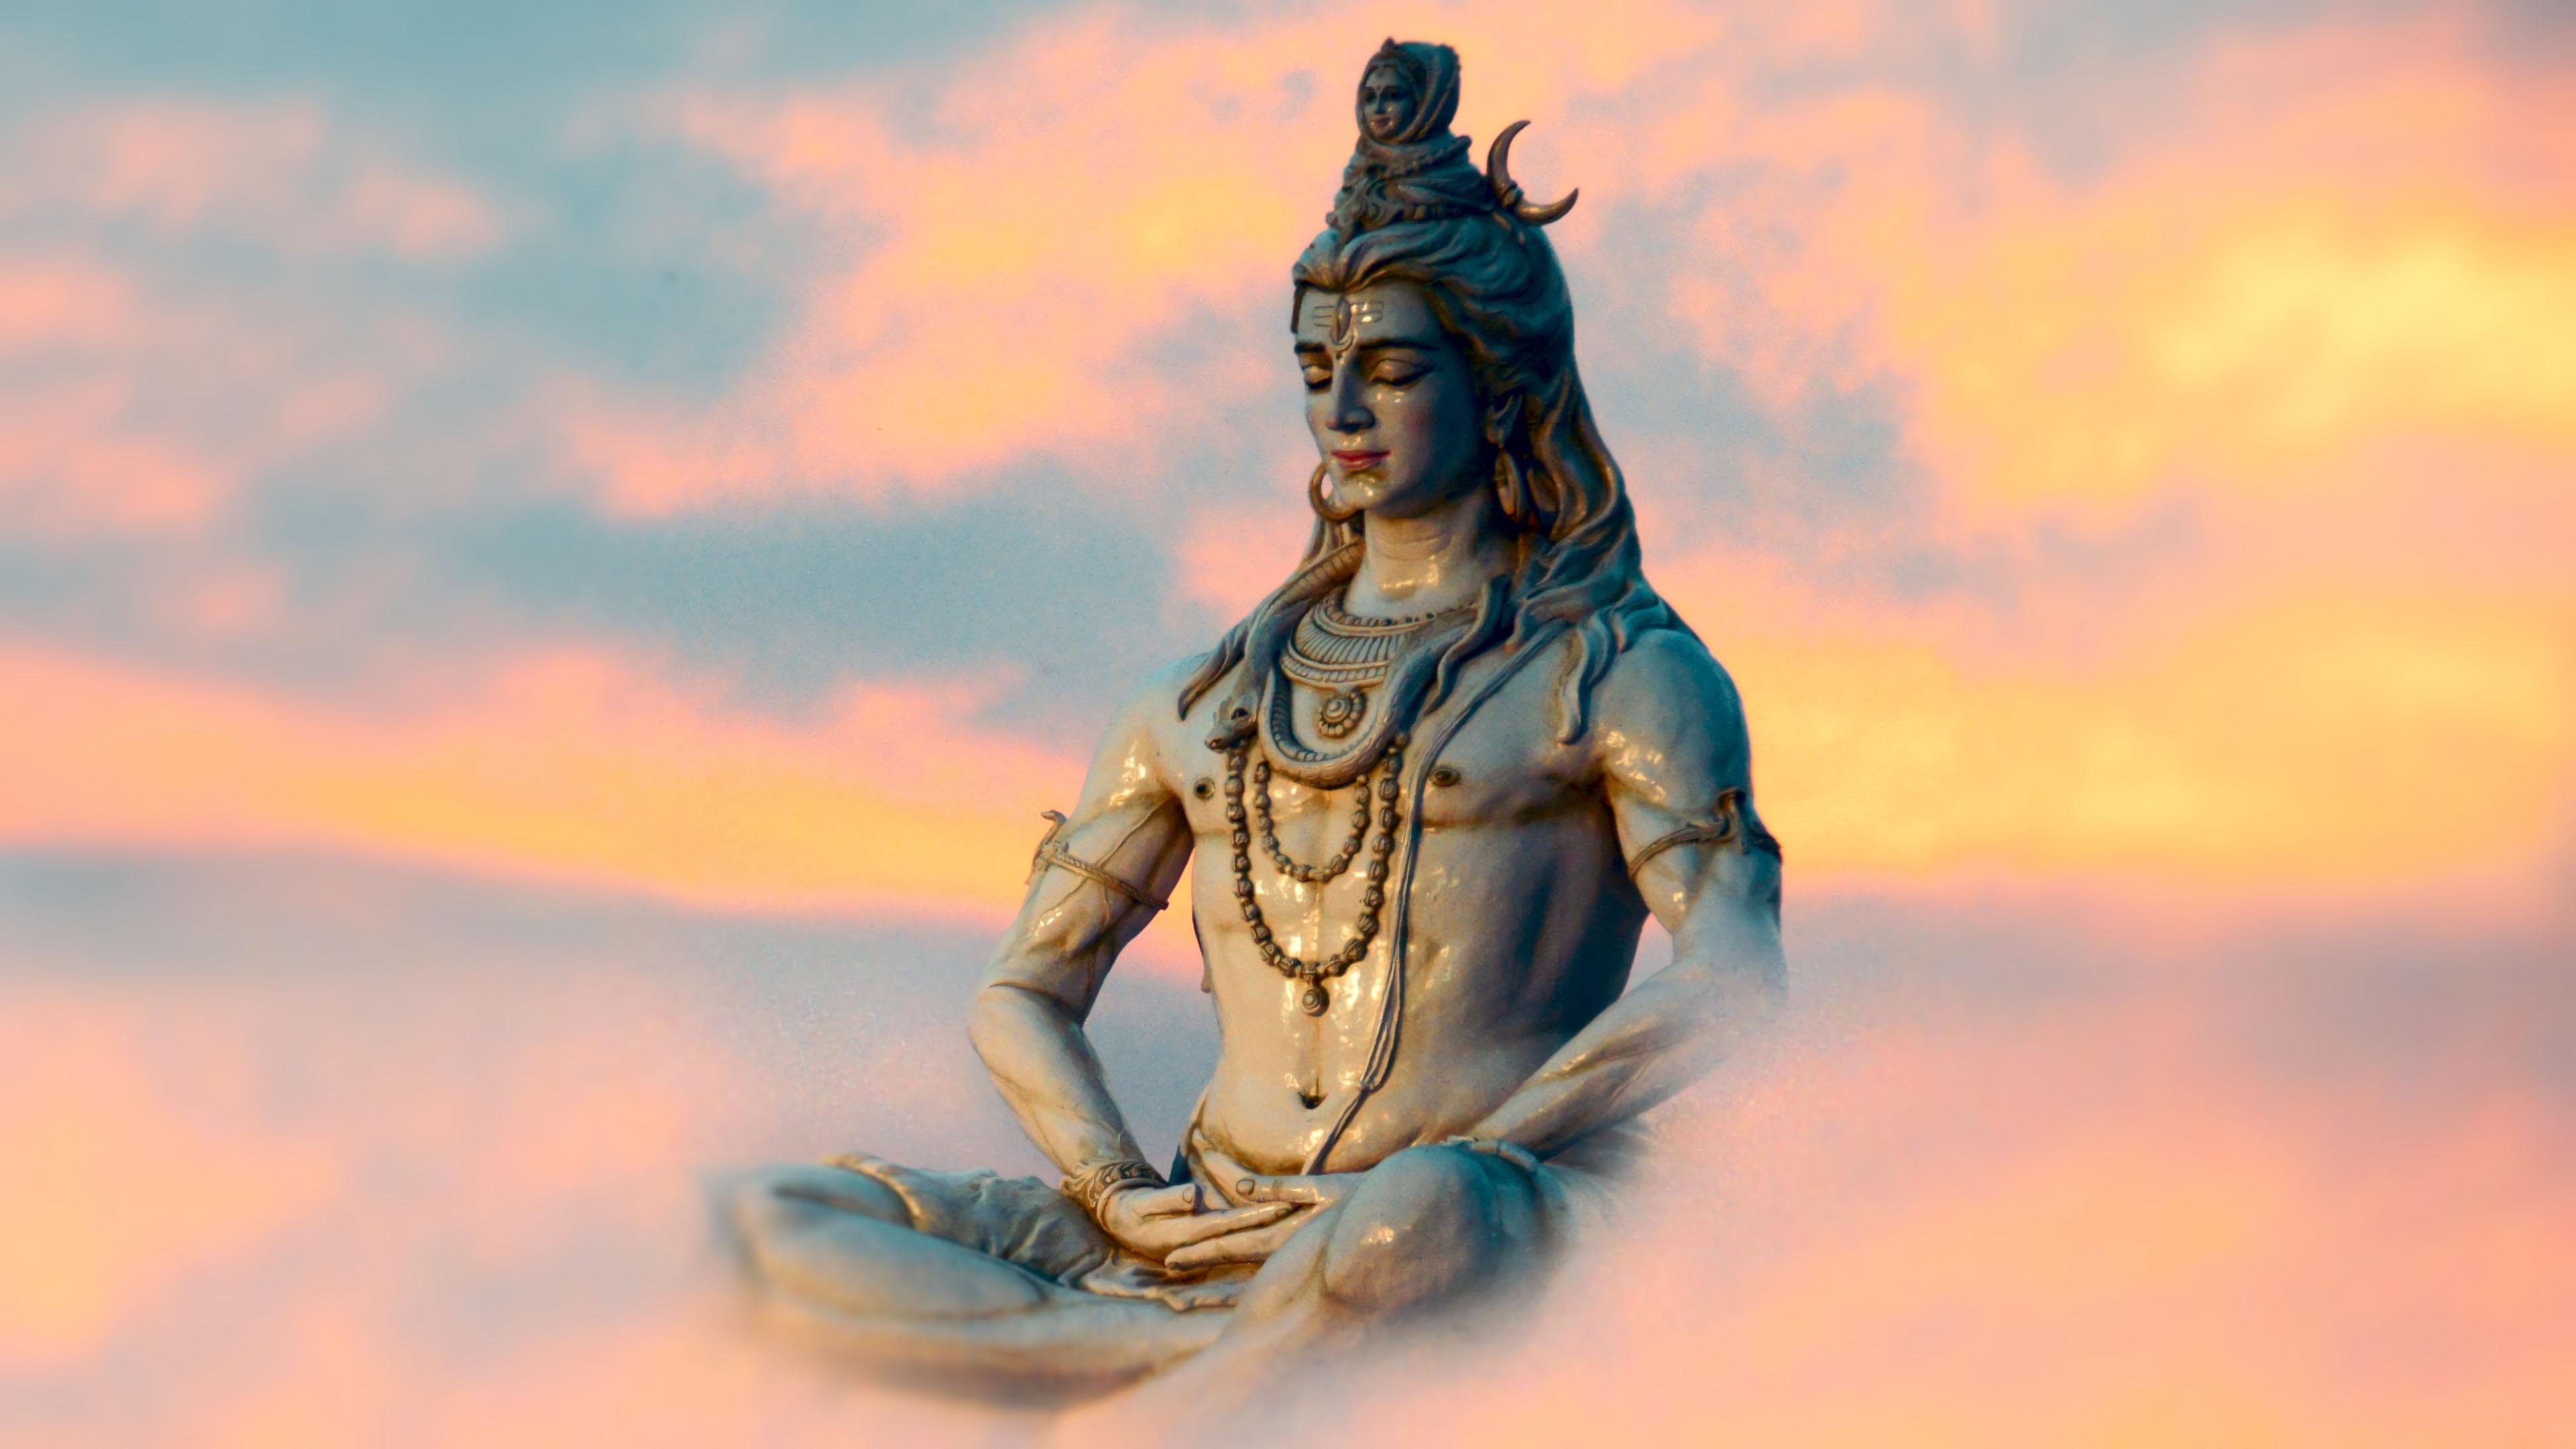 4k Ultra Hd Lord Shiva Pc Wallpaper Novocom Top